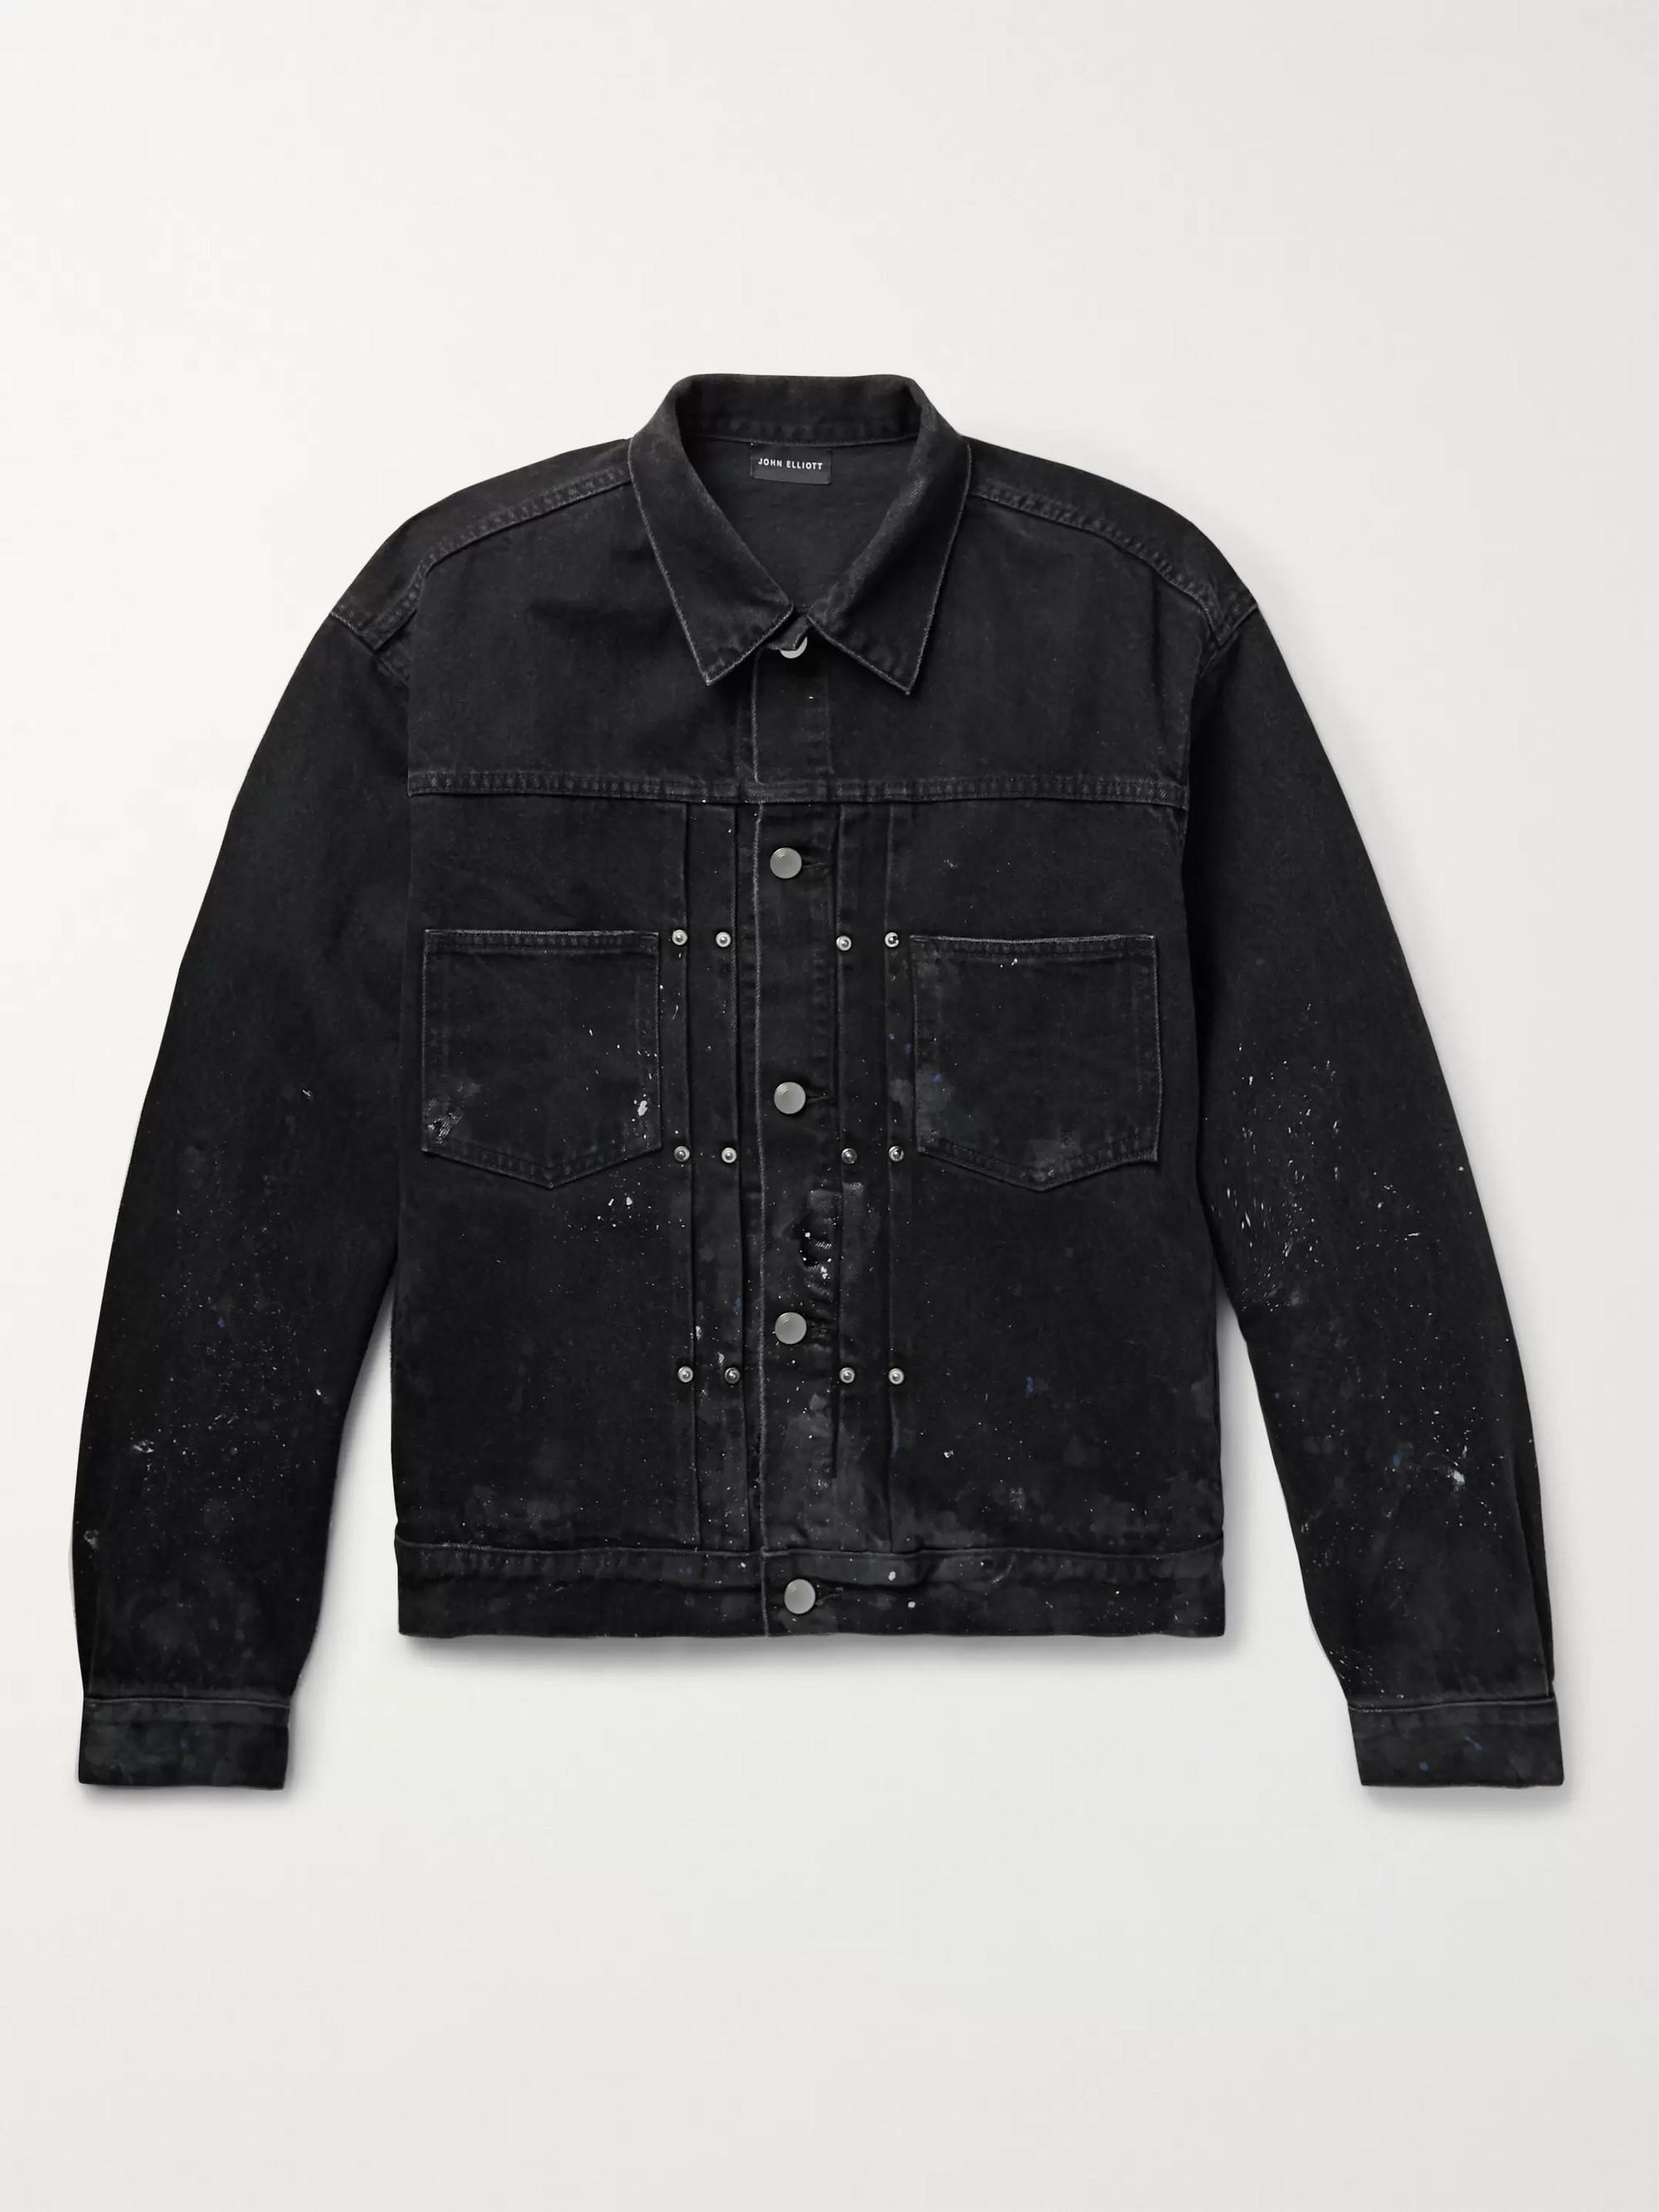 John Elliott Thumper Slim-Fit Paint-Splattered Distressed Denim Jacket